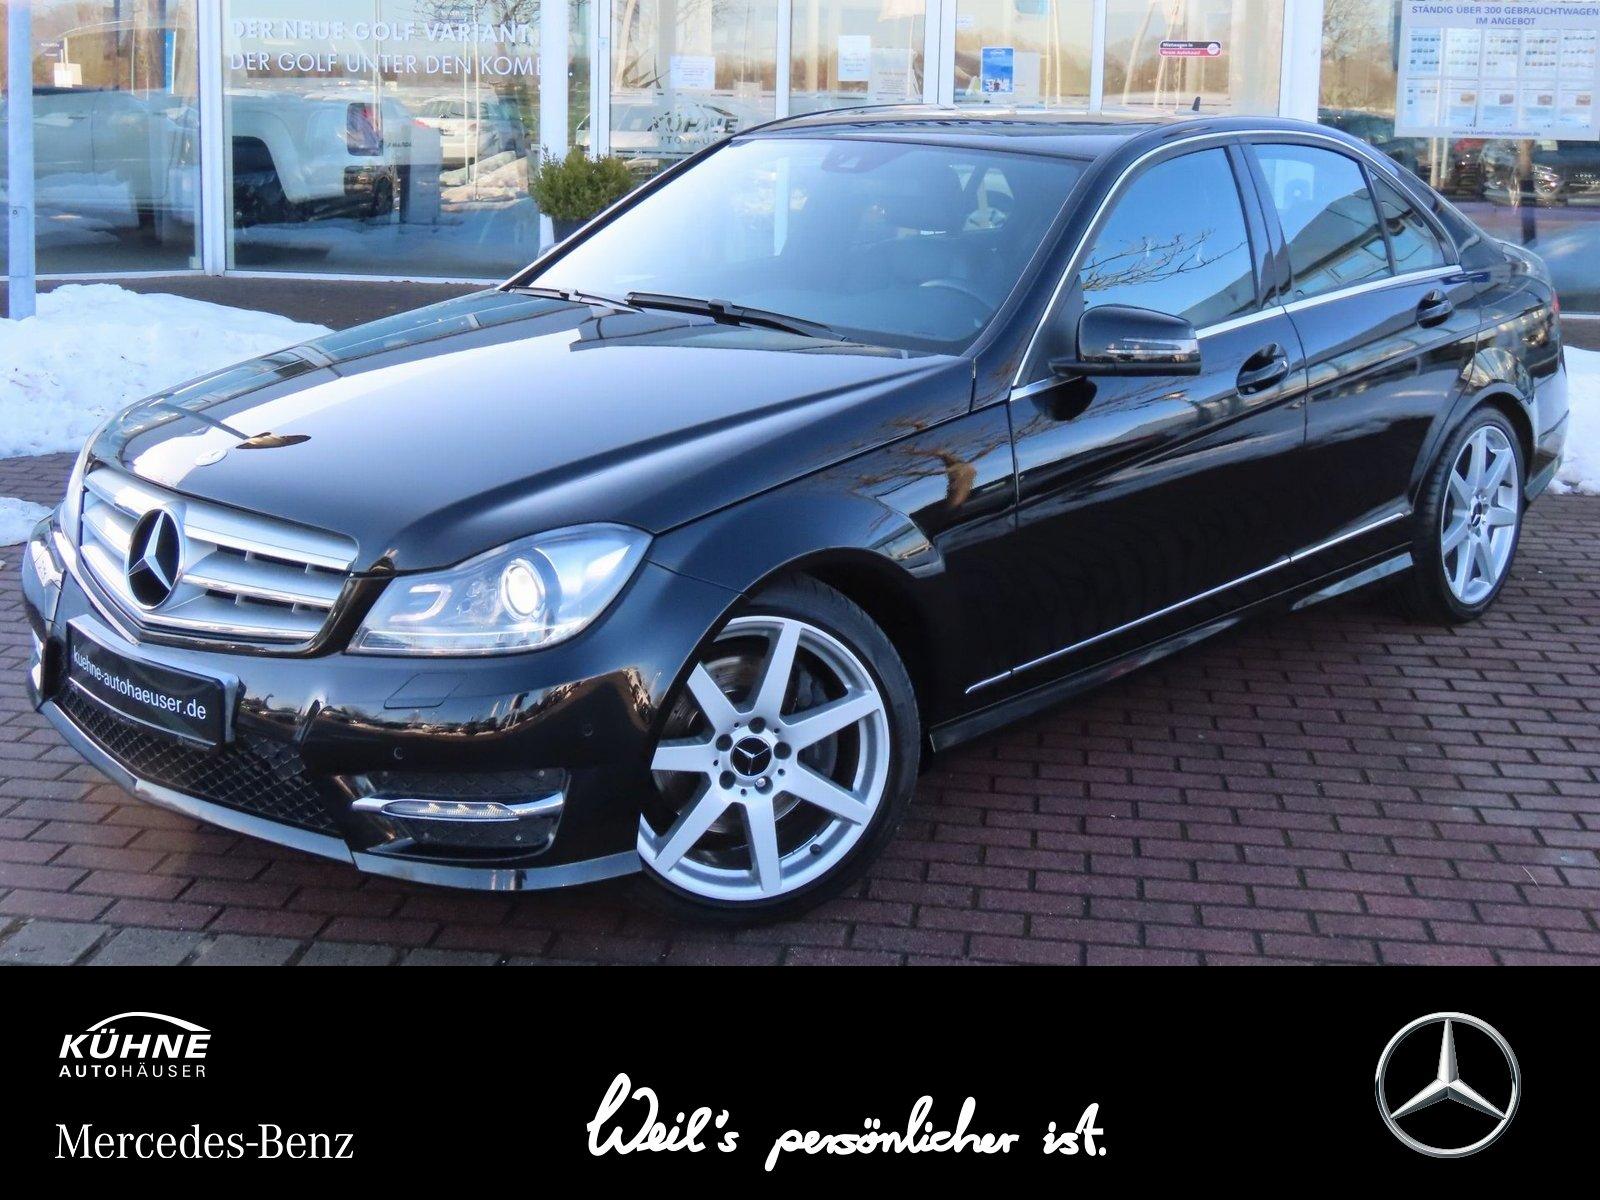 Mercedes-Benz C 250 CDI 4matic/AMG-Sportp./PTS/Comand/ILS/SHD, Jahr 2013, Diesel